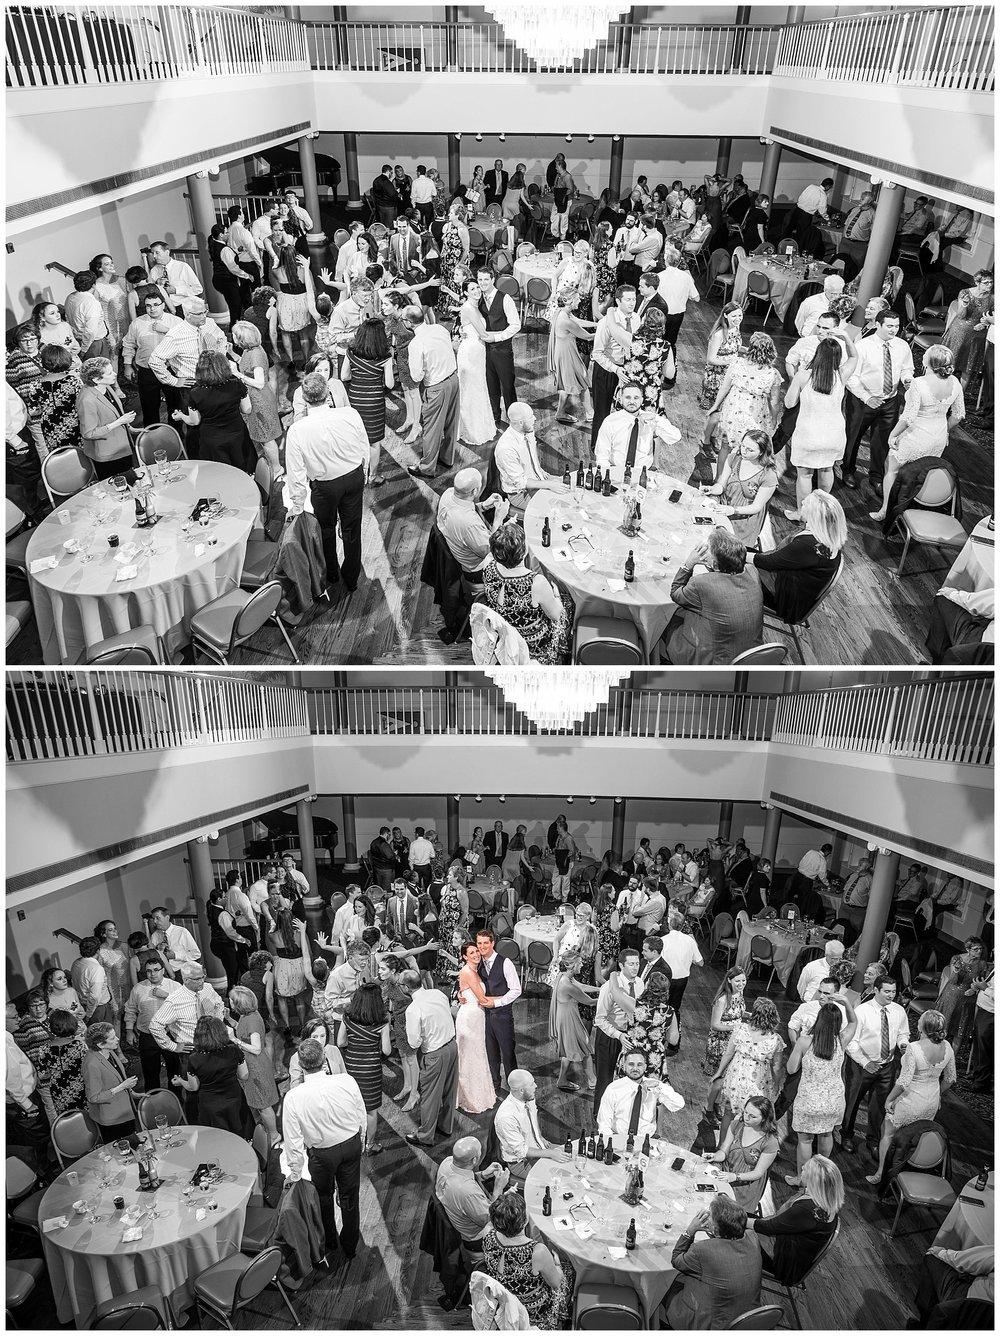 TracyPatrick-LoyolaCollege-PrestonHall-Wedding-LivingRadiantPhotography-photos_0126.jpg